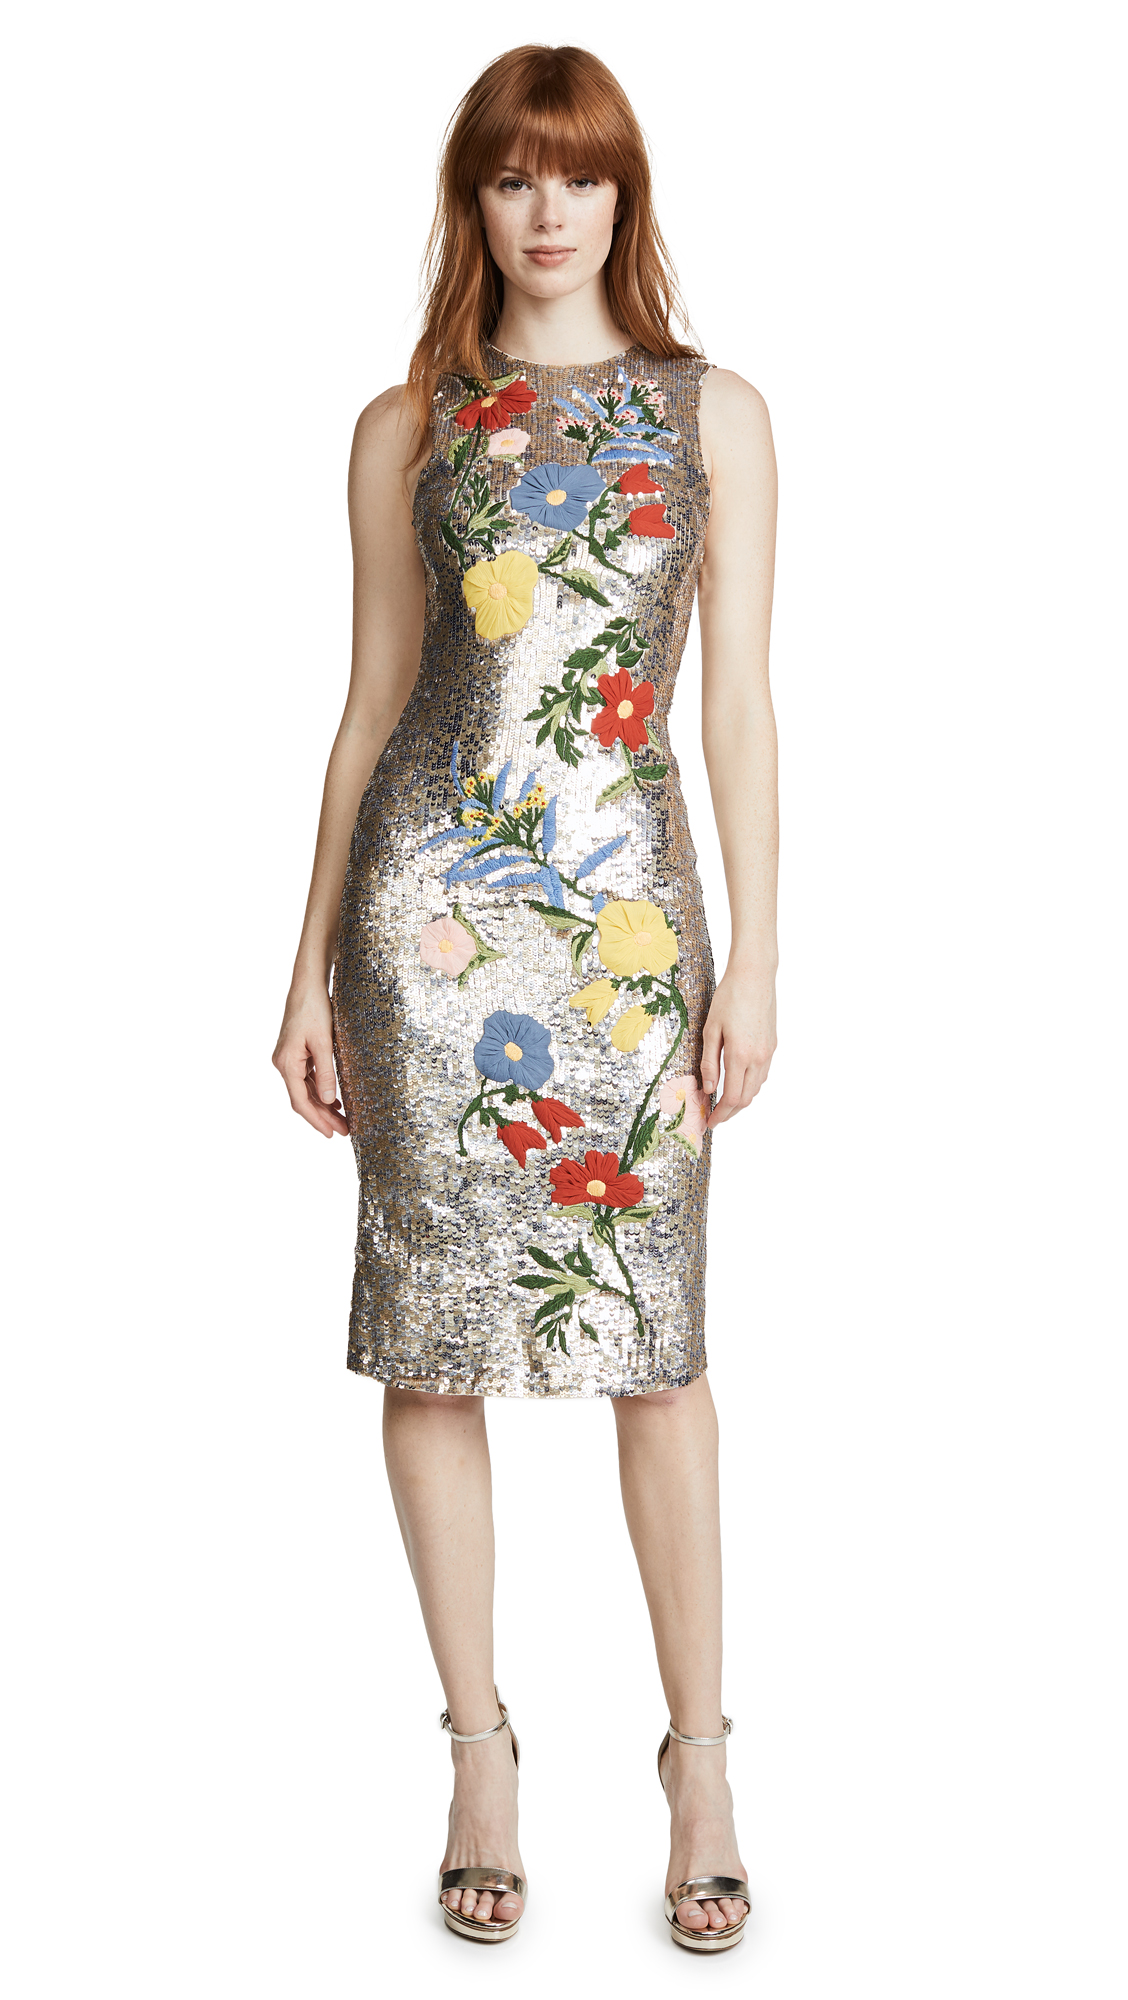 alice + olivia Nat Embroidered Dress - Antique Silver/Multi